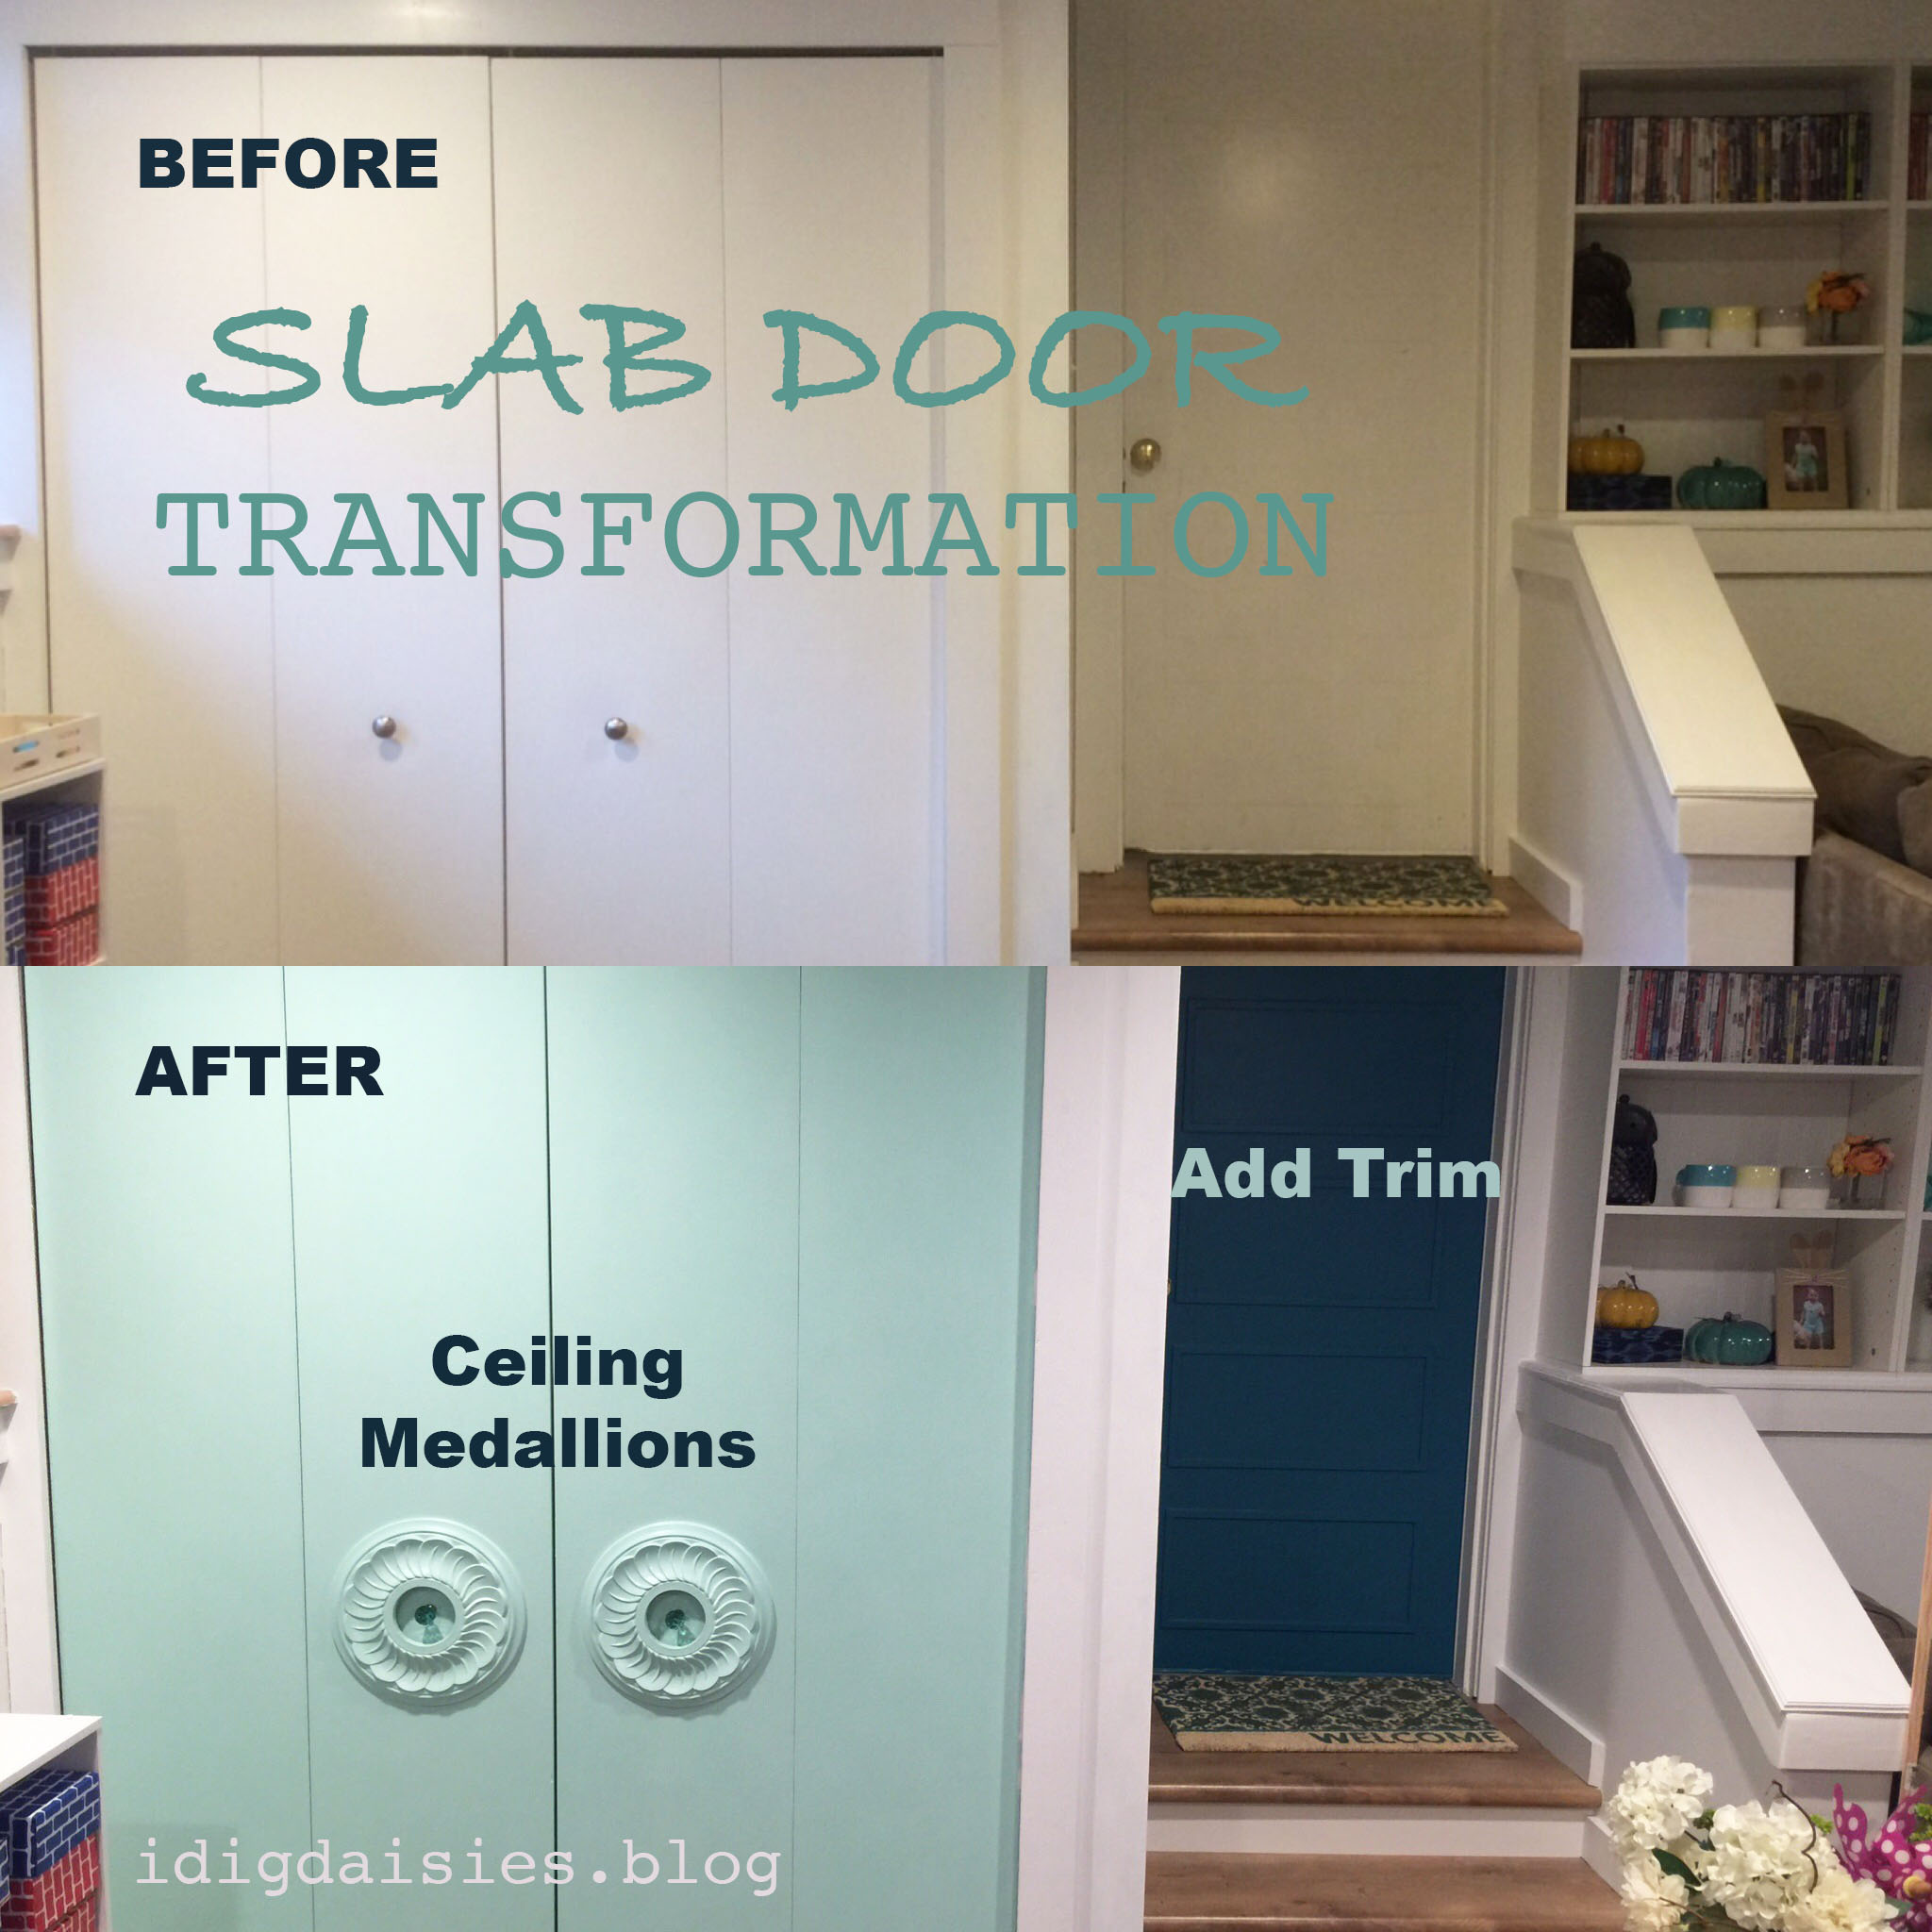 & $30 Bi-Fold Door Transformation   i dig daisies